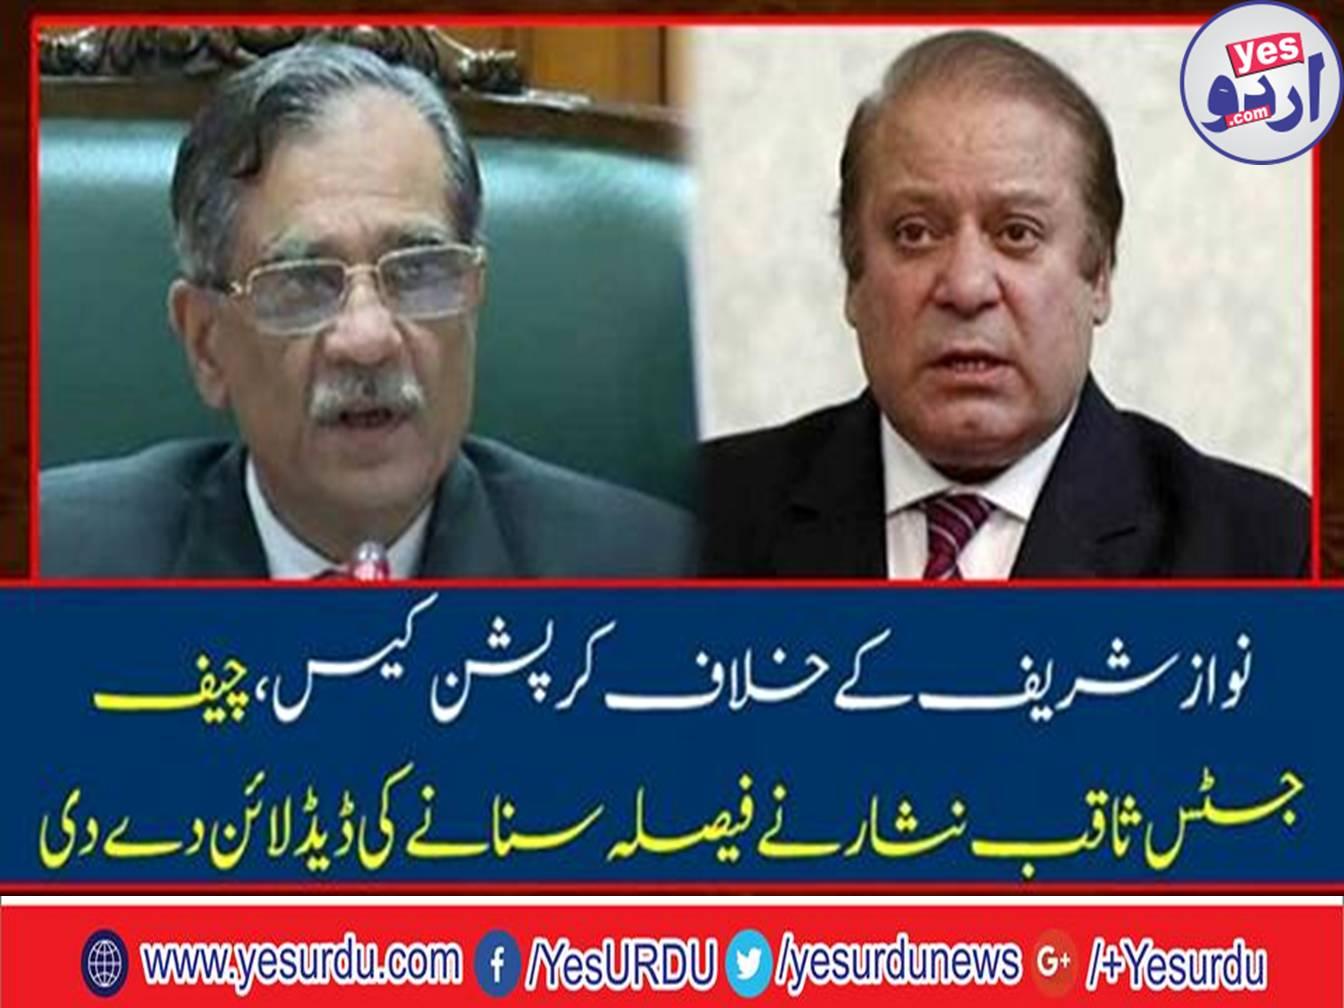 Chief Justice Saqib Nisar gave a deadline